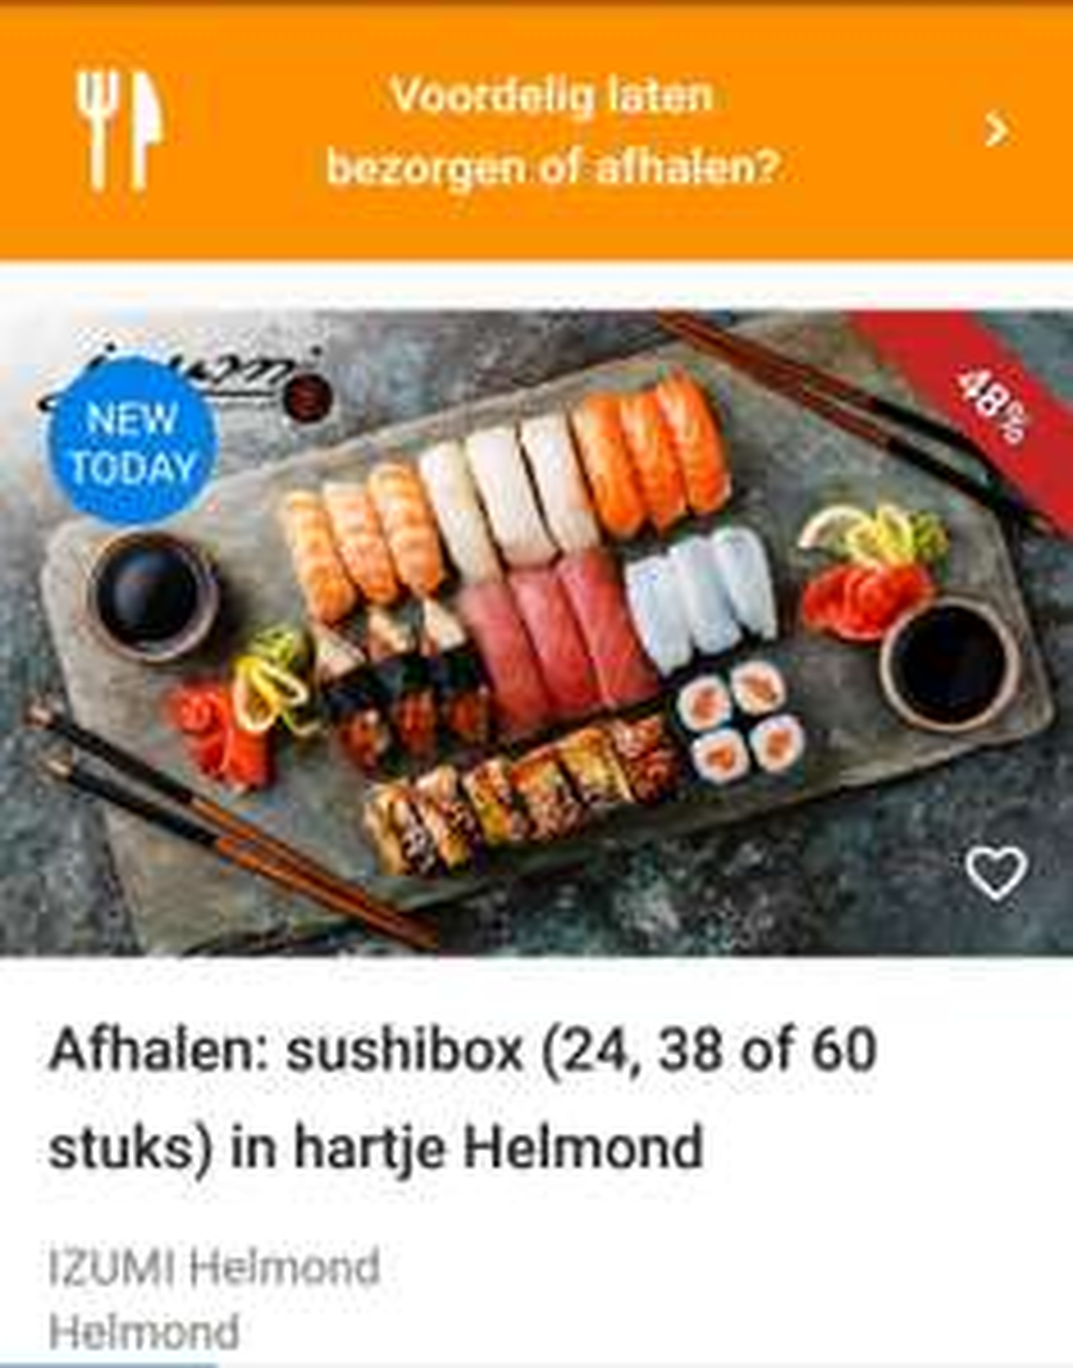 Sushi boxen bij Izumi in Helmond (20, 38 of 60 stuks)